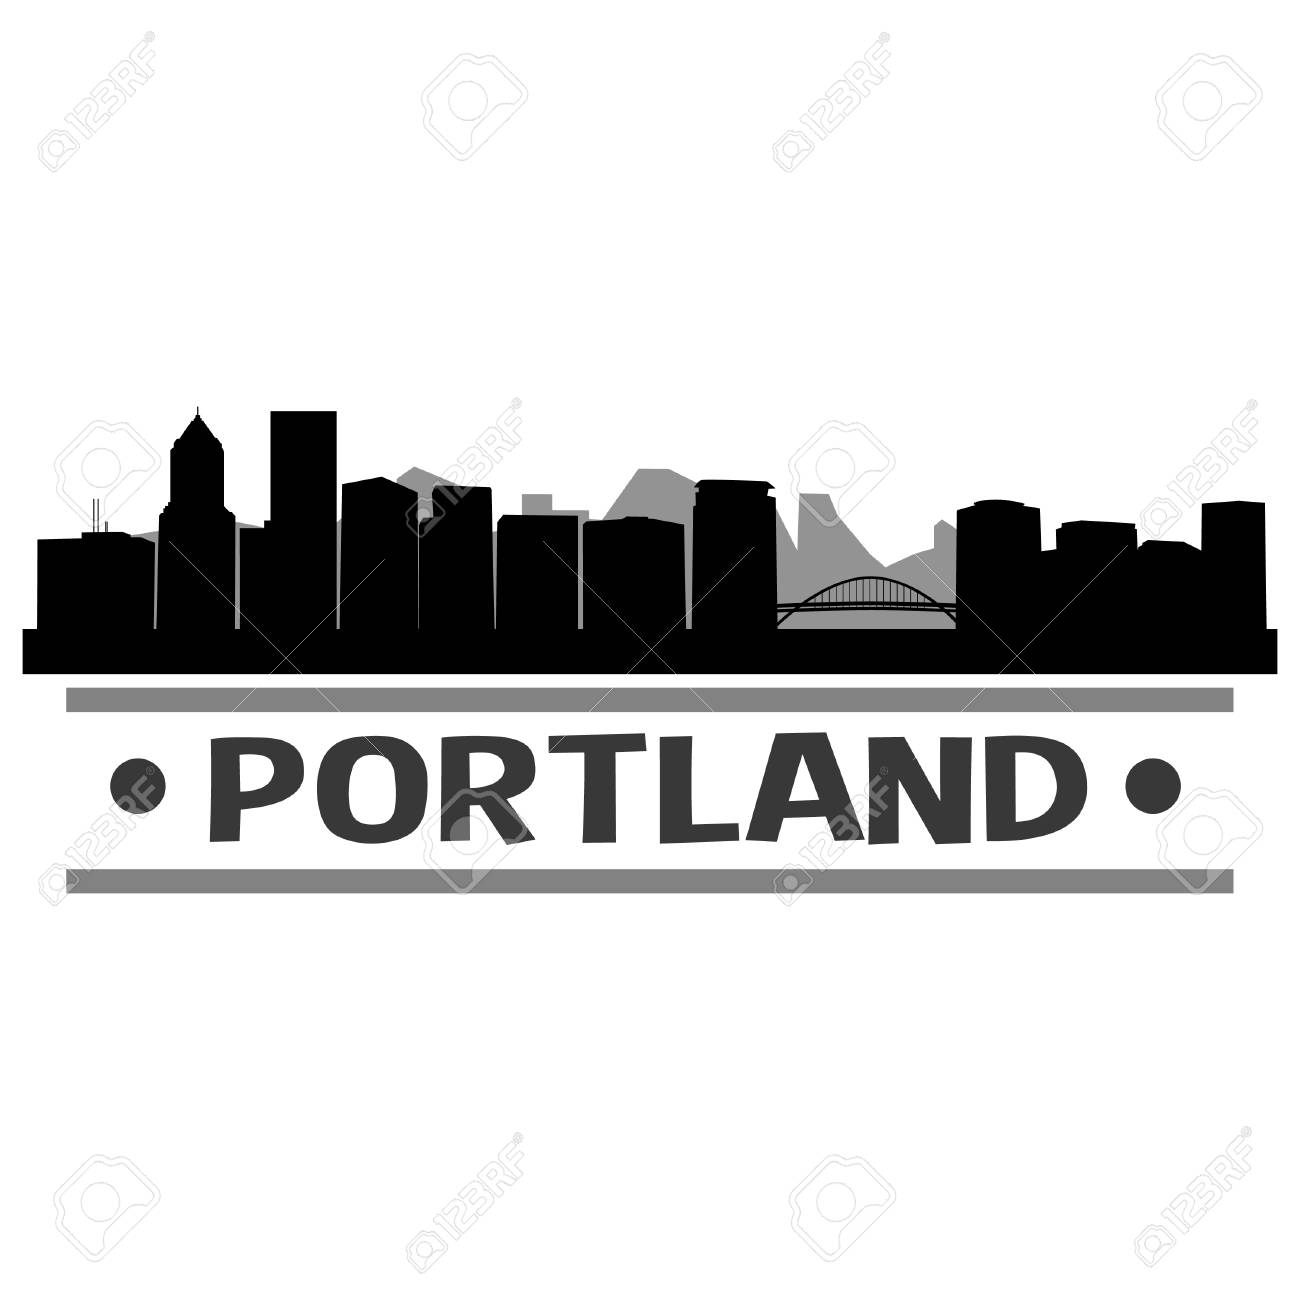 Portland Skyline Logo Wiring Diagrams 20152016 Nissan Nv Curt T Connector Harness 56279 Oregon United States Of America Usa Icon Vector Art Rh 123rf Com Atlanta Maine